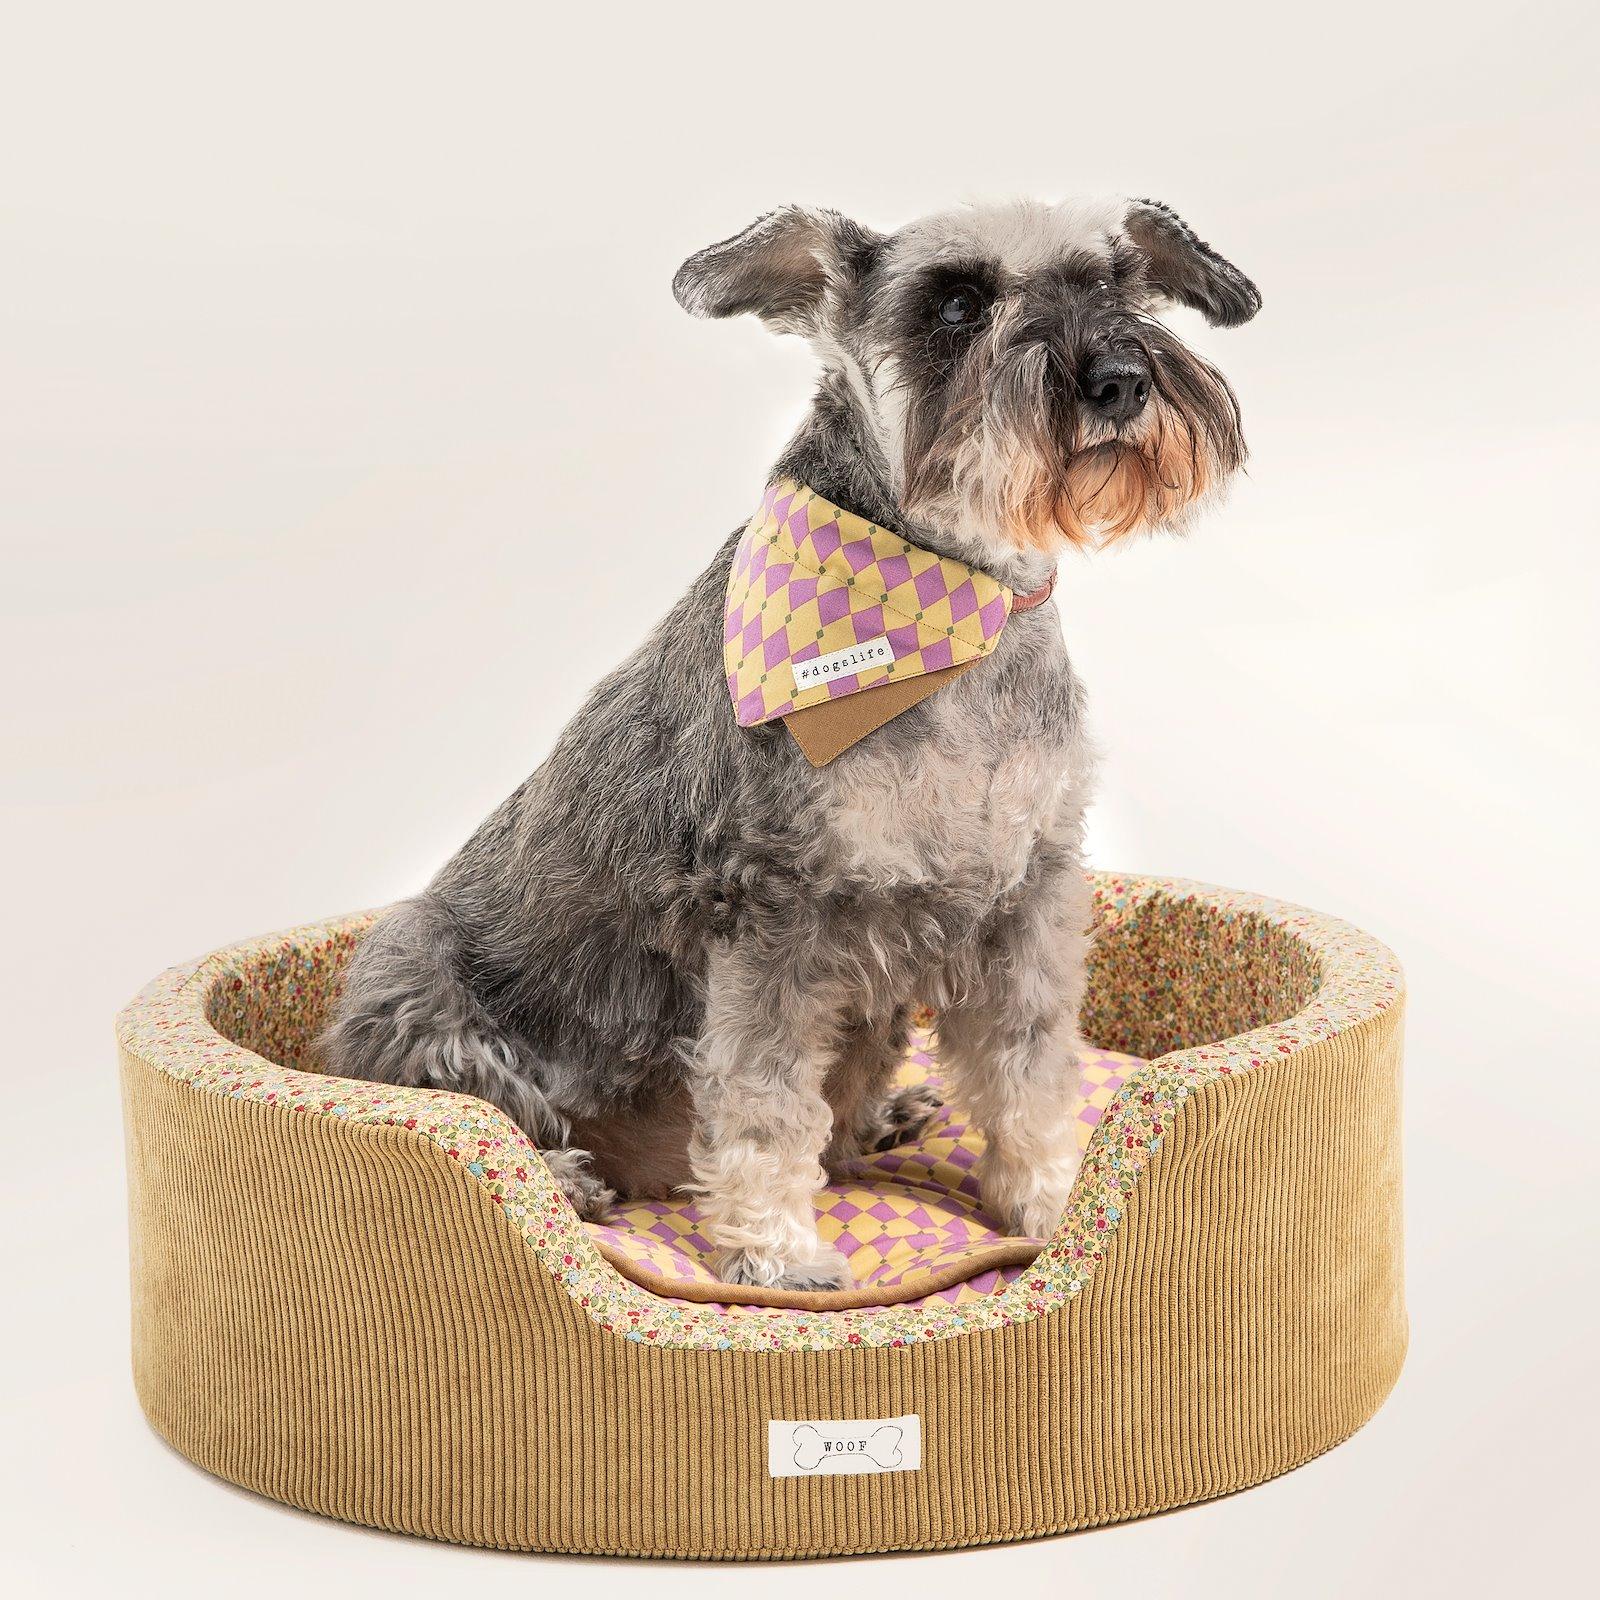 Dog basket DIY9017_852411_780540_24849_p90348_824155_852414_780540_852410_24849_bundle